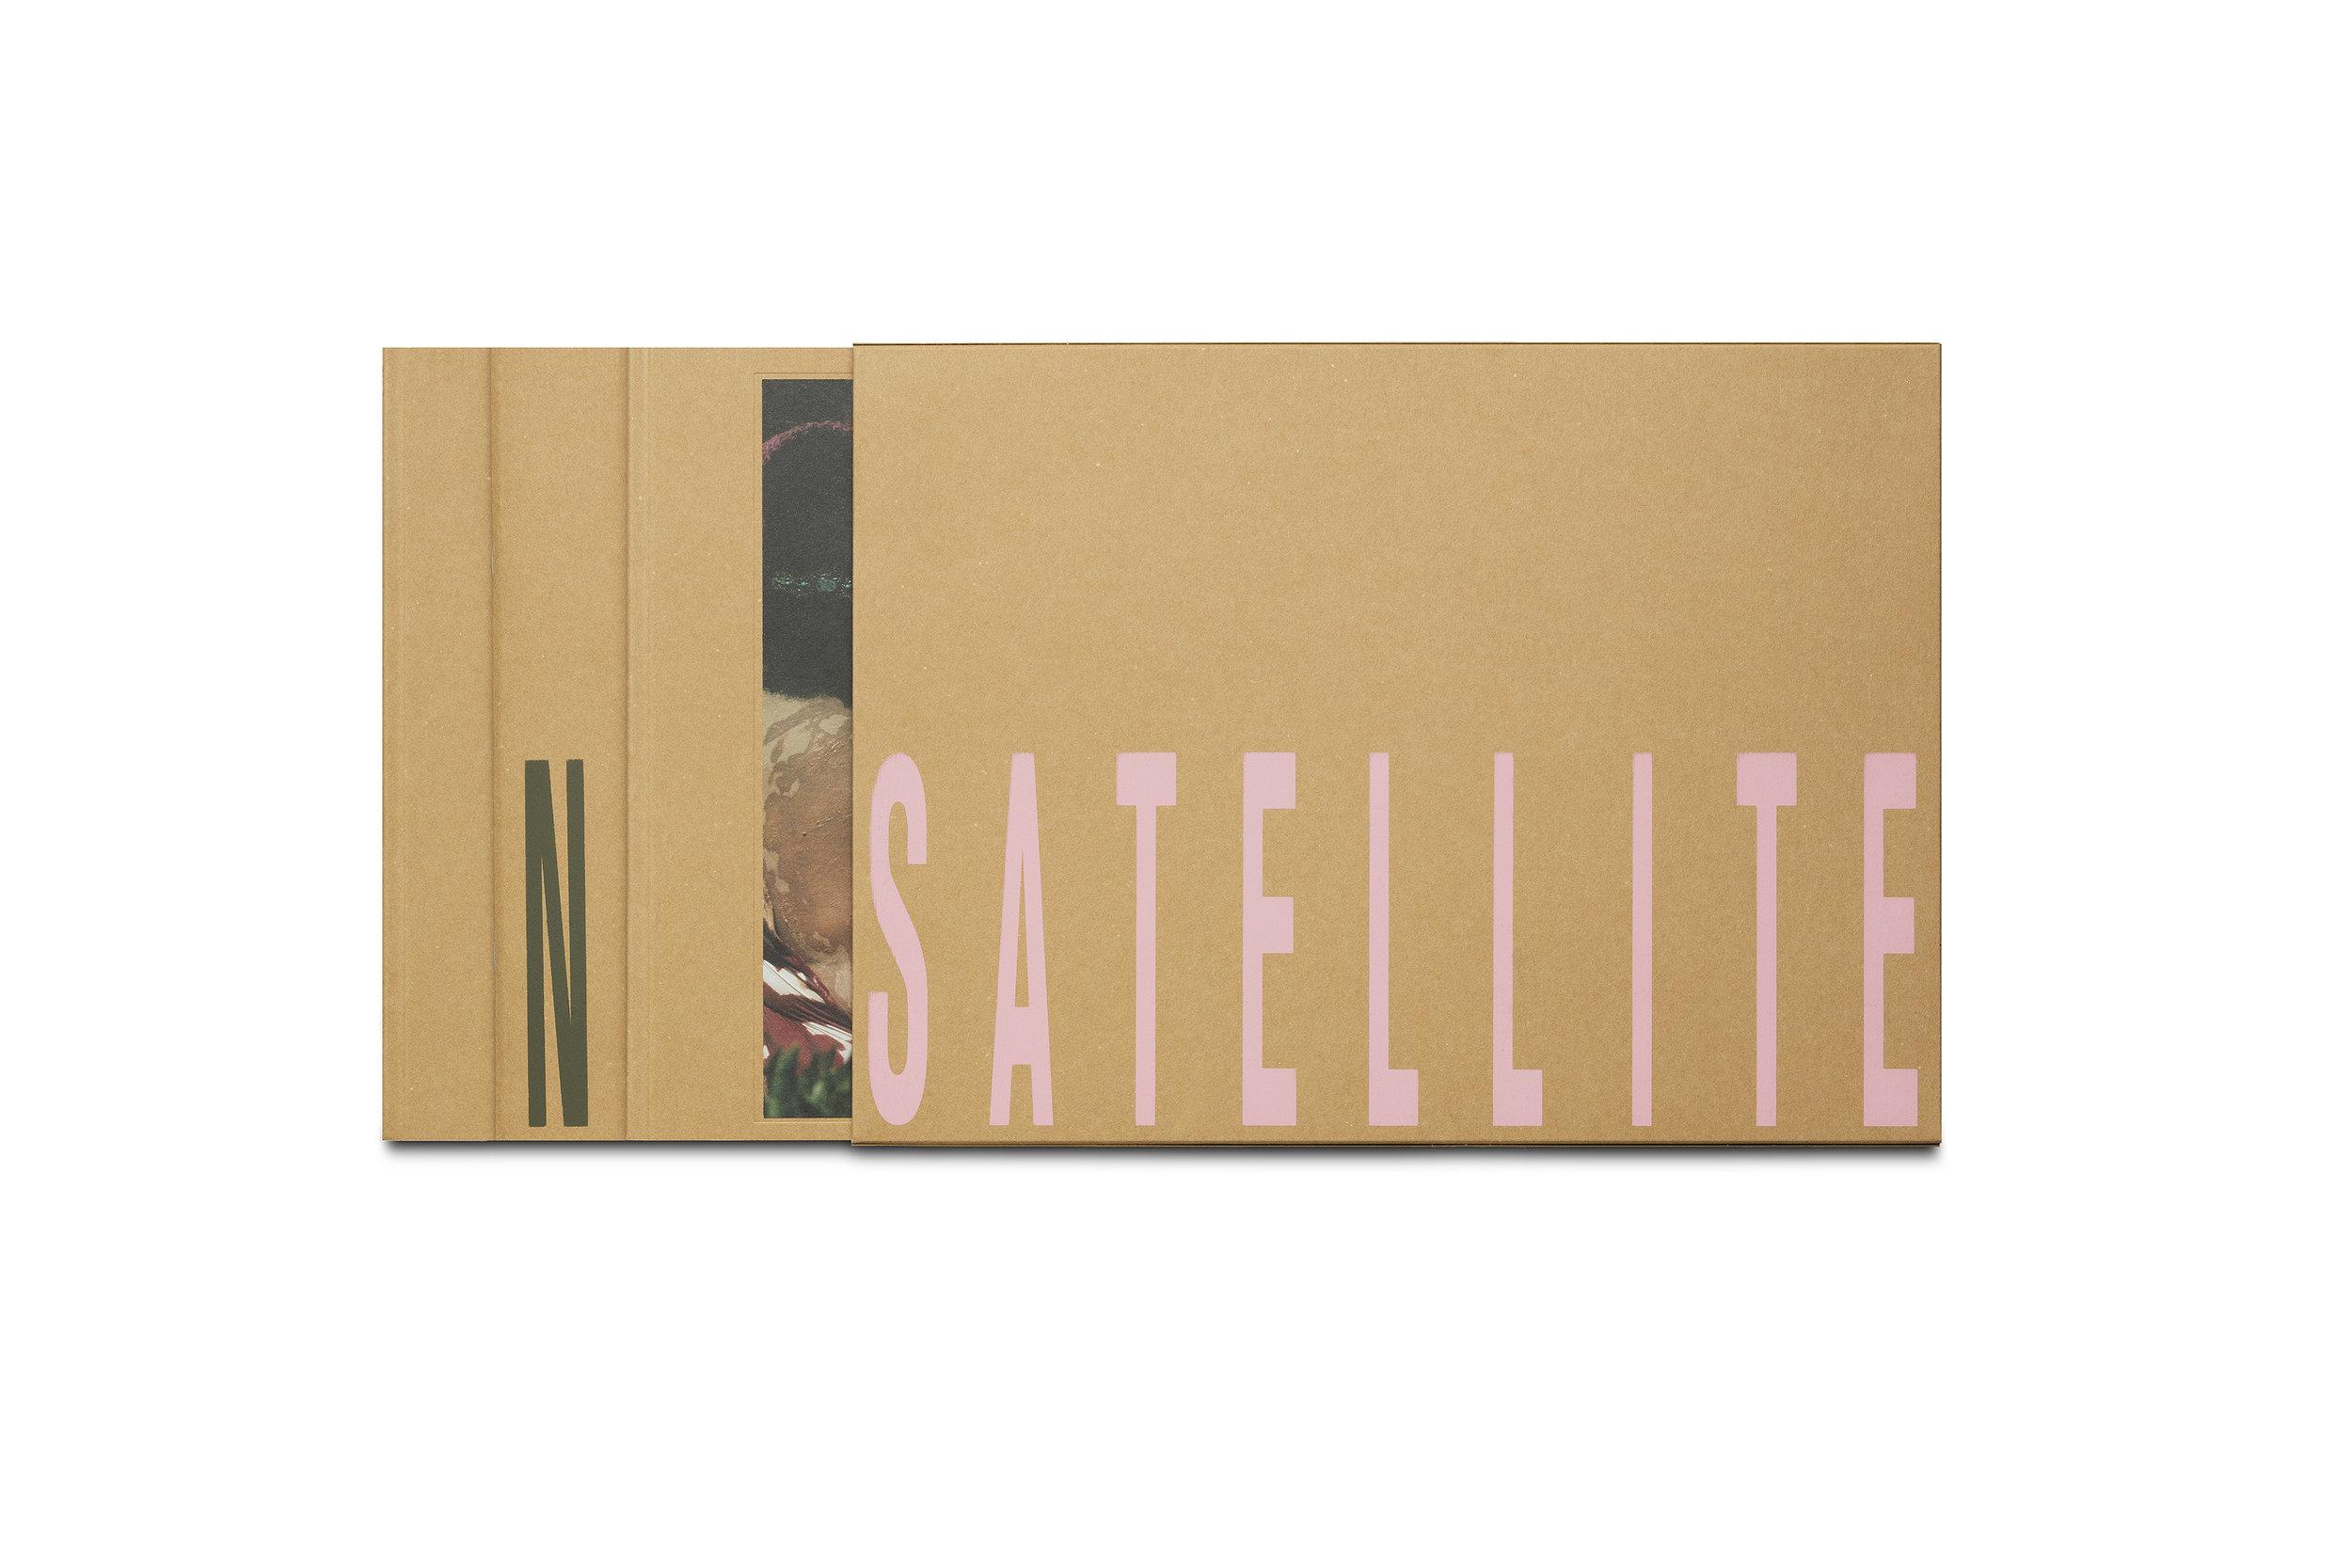 Box-Satellite.jpg